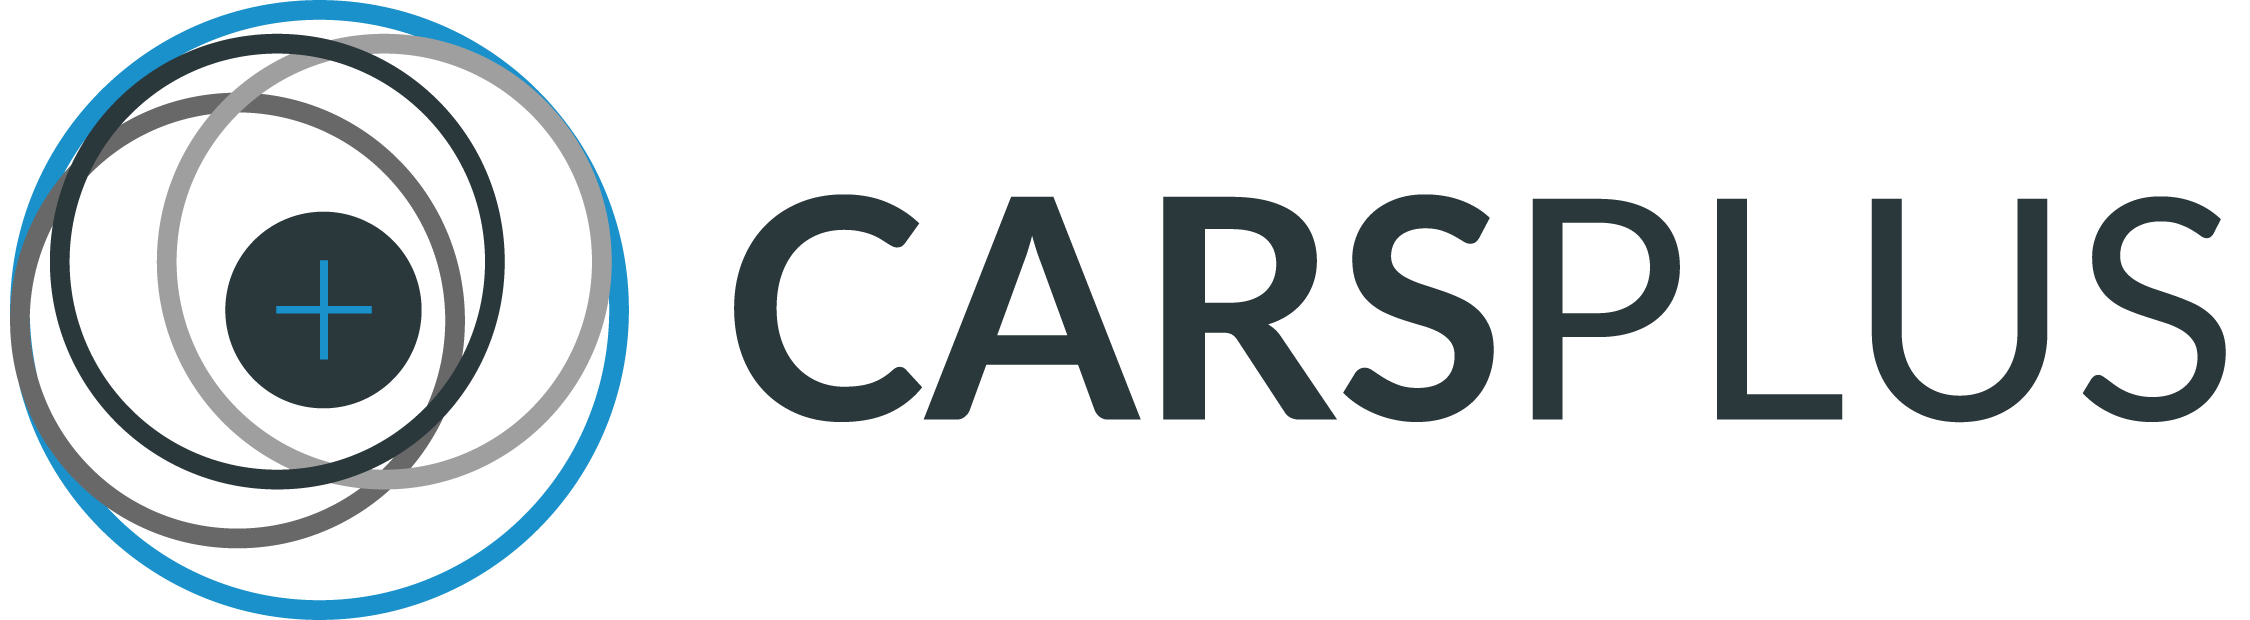 Carsplus logo